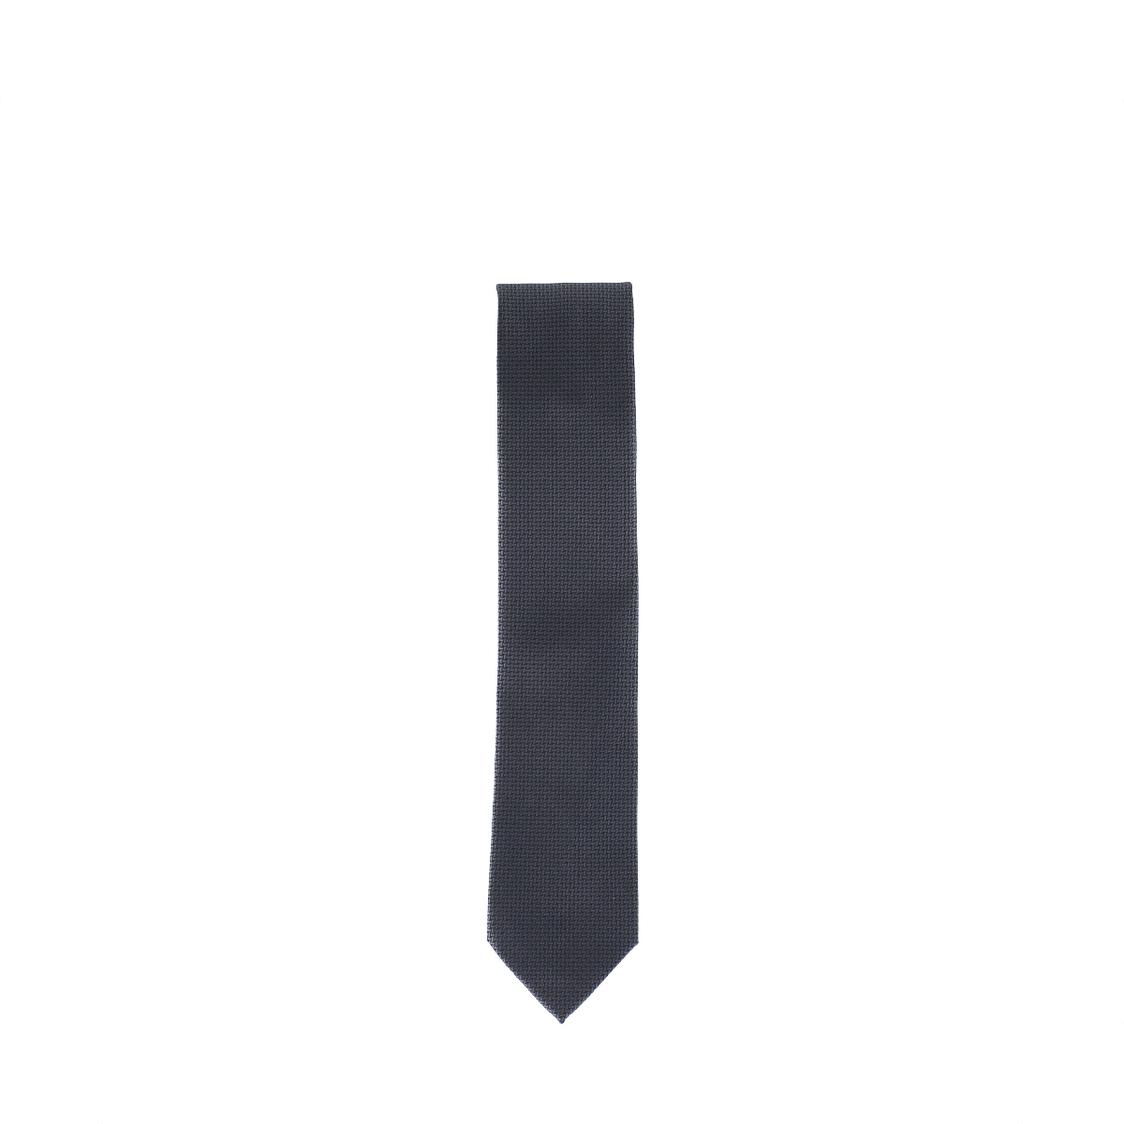 Pierre Cardin 100 Micro Polyester 7cm Black Tie